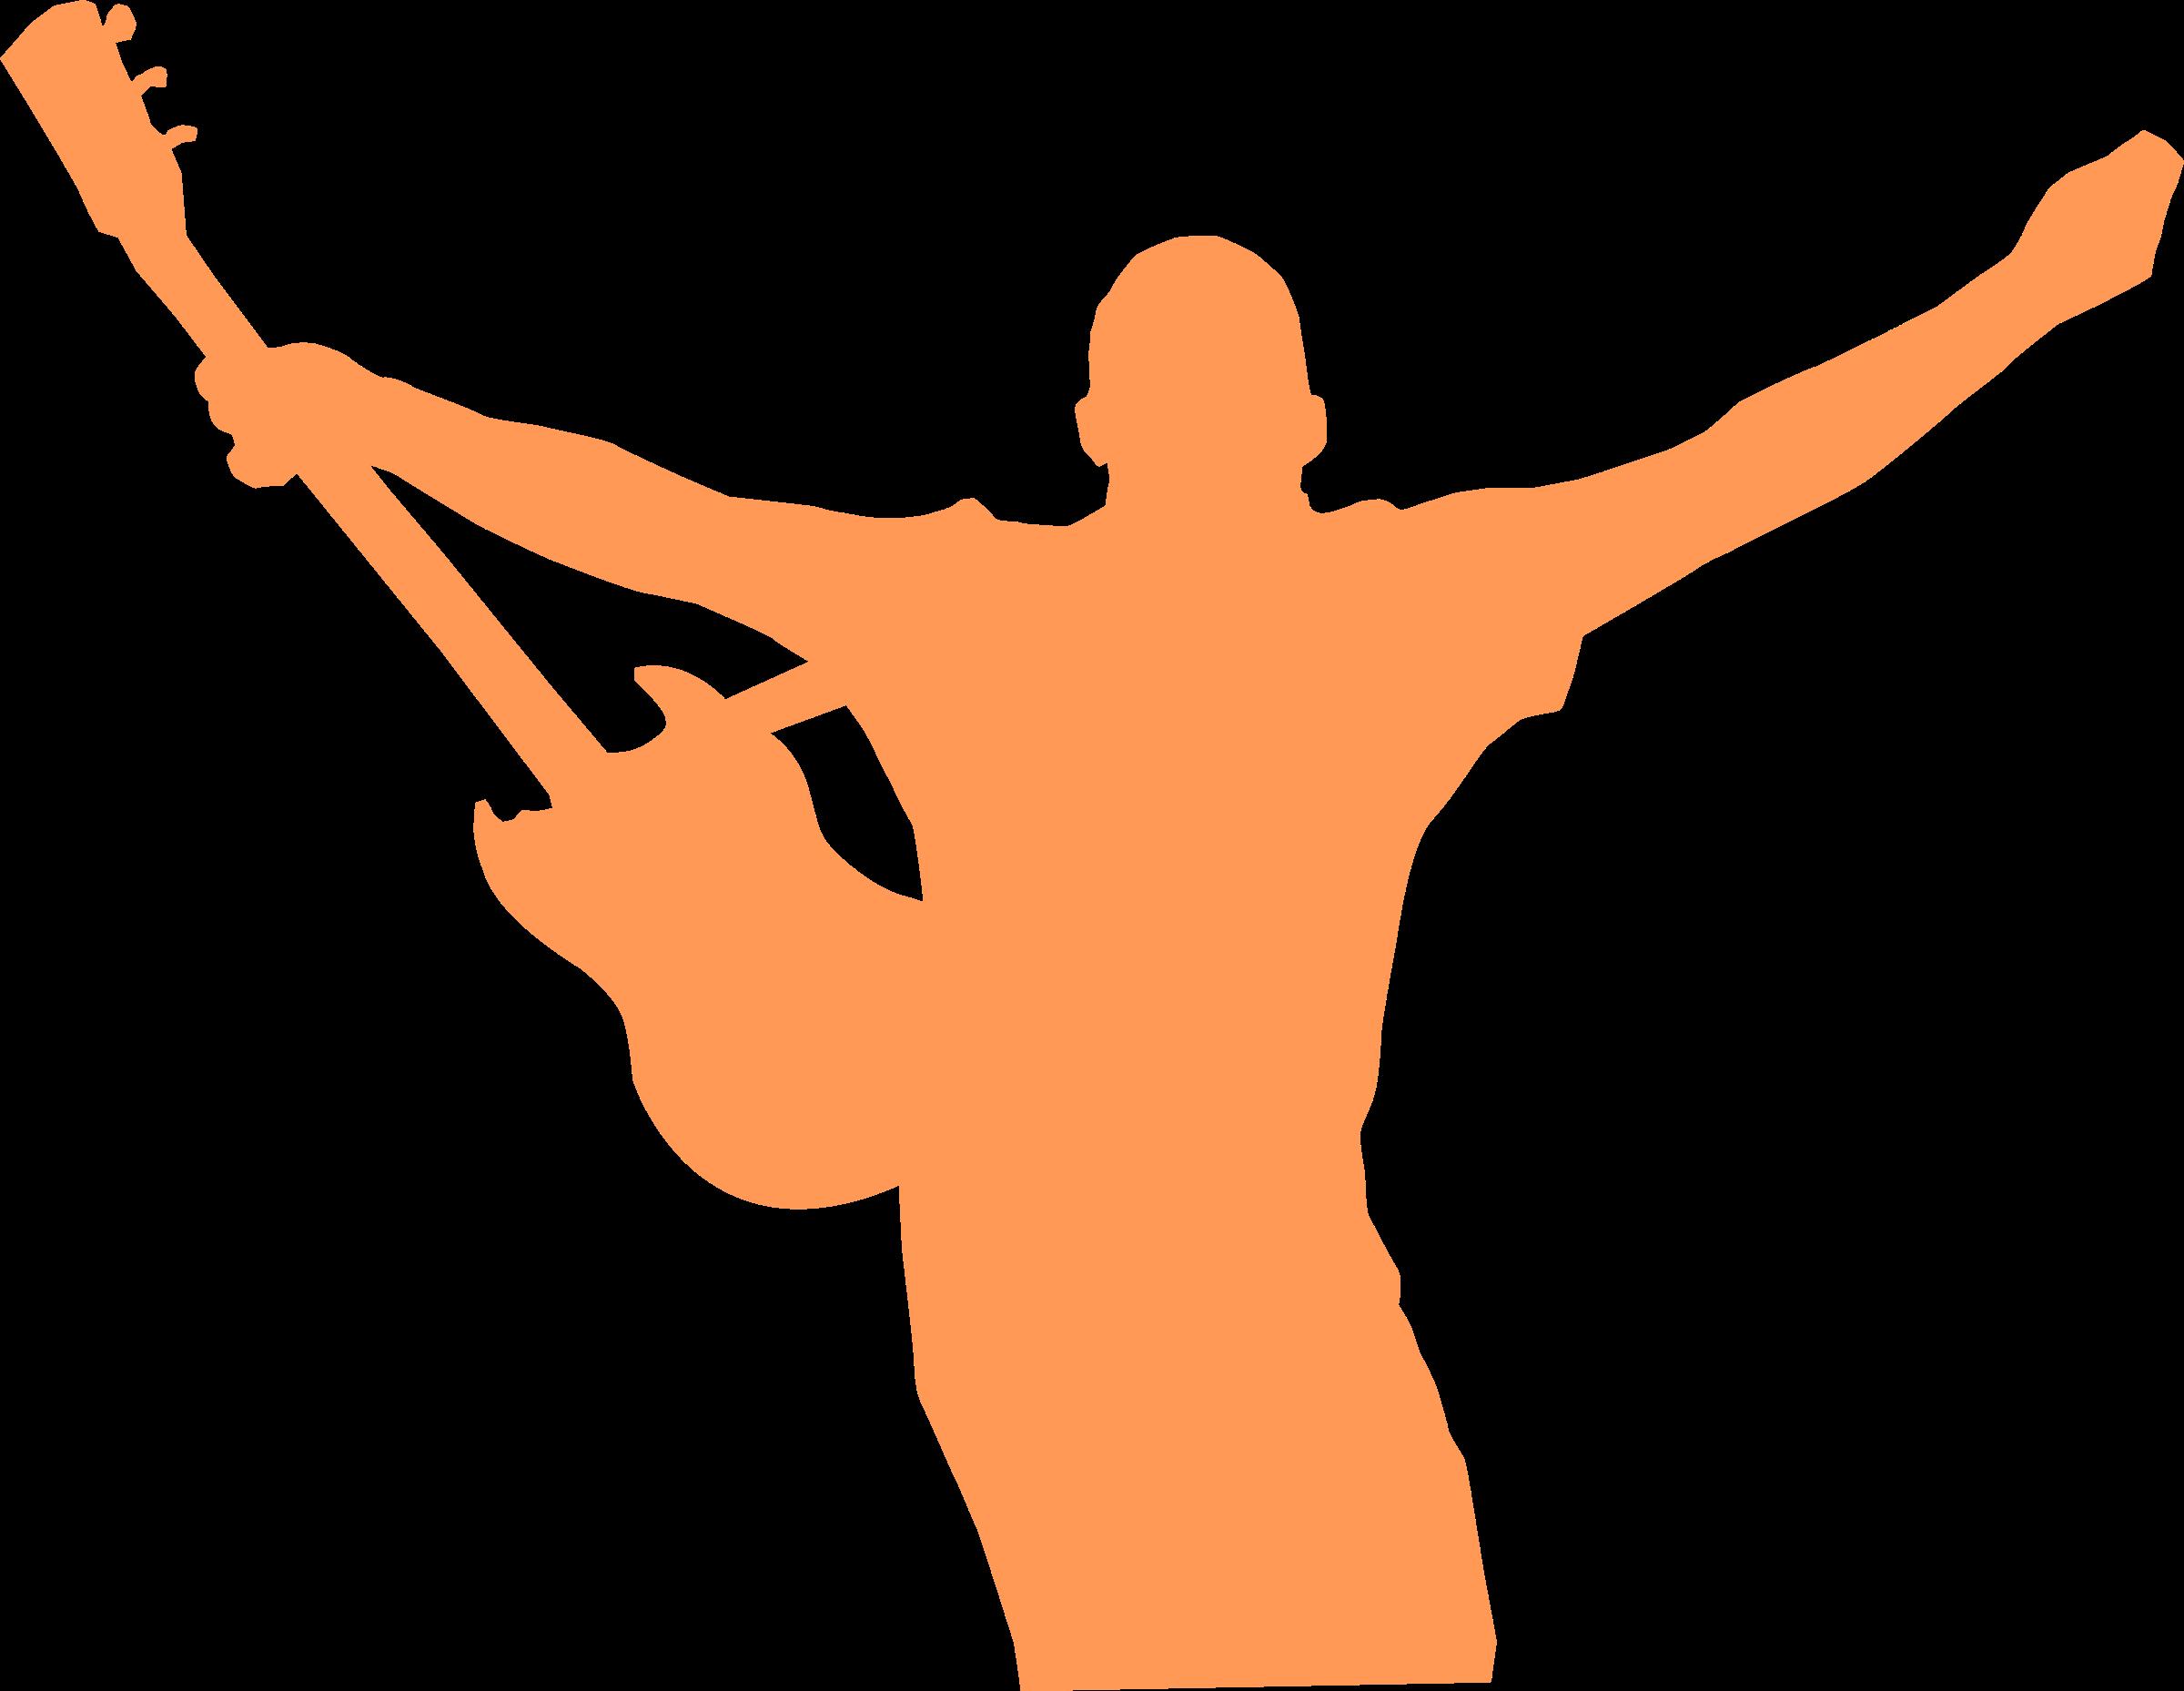 Clipart guitar symbol. Man and big image